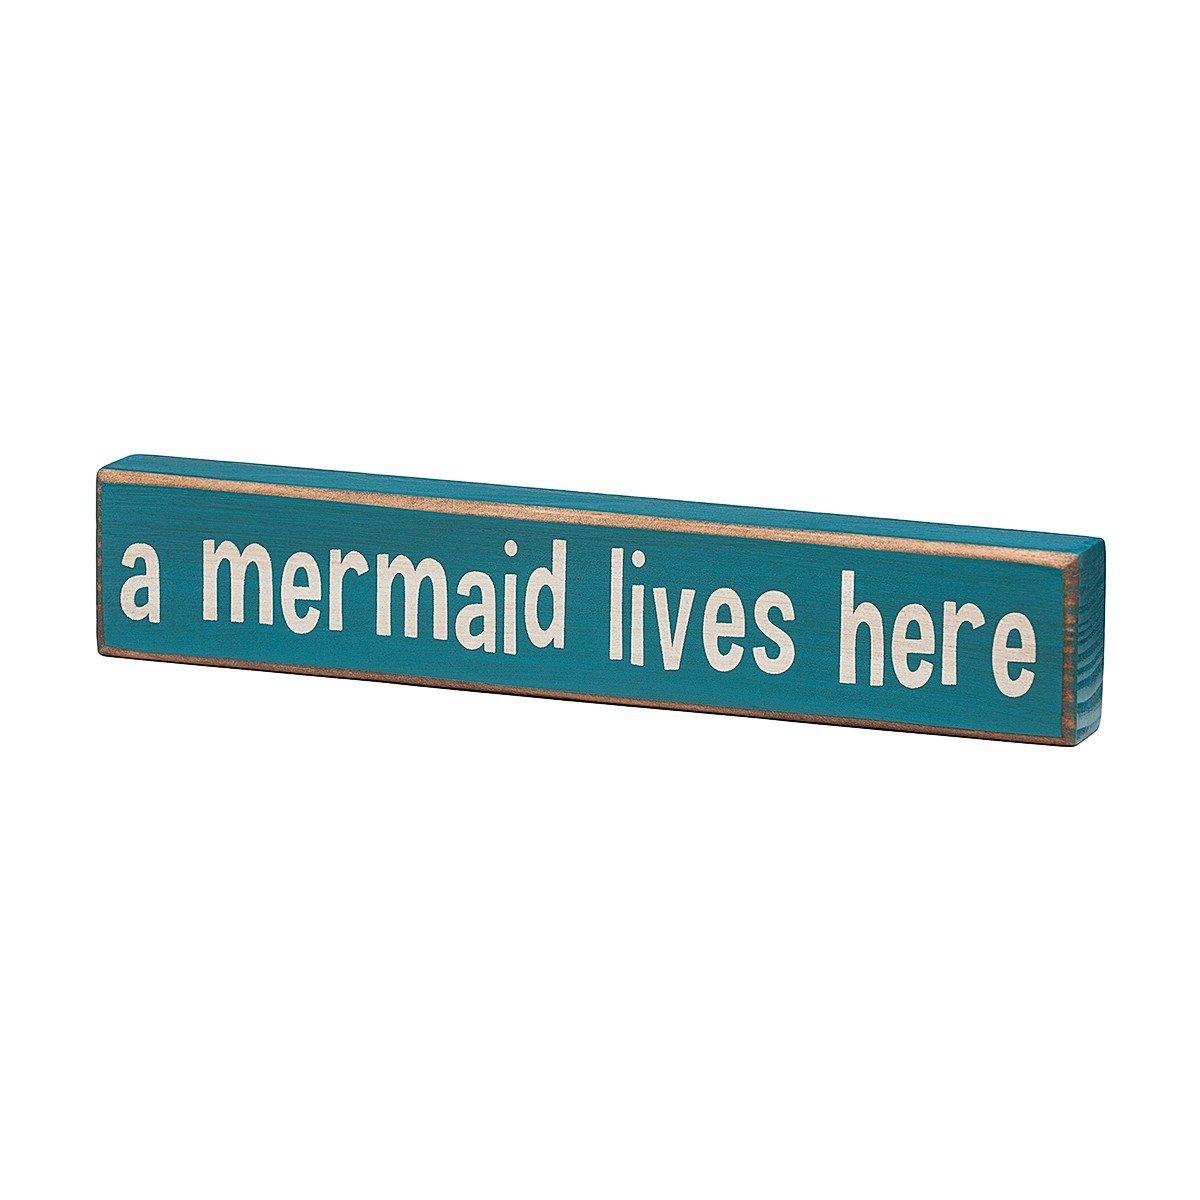 A Mermaid Lives Here - Vintage Coastal Mini Wood Sign - 8-in